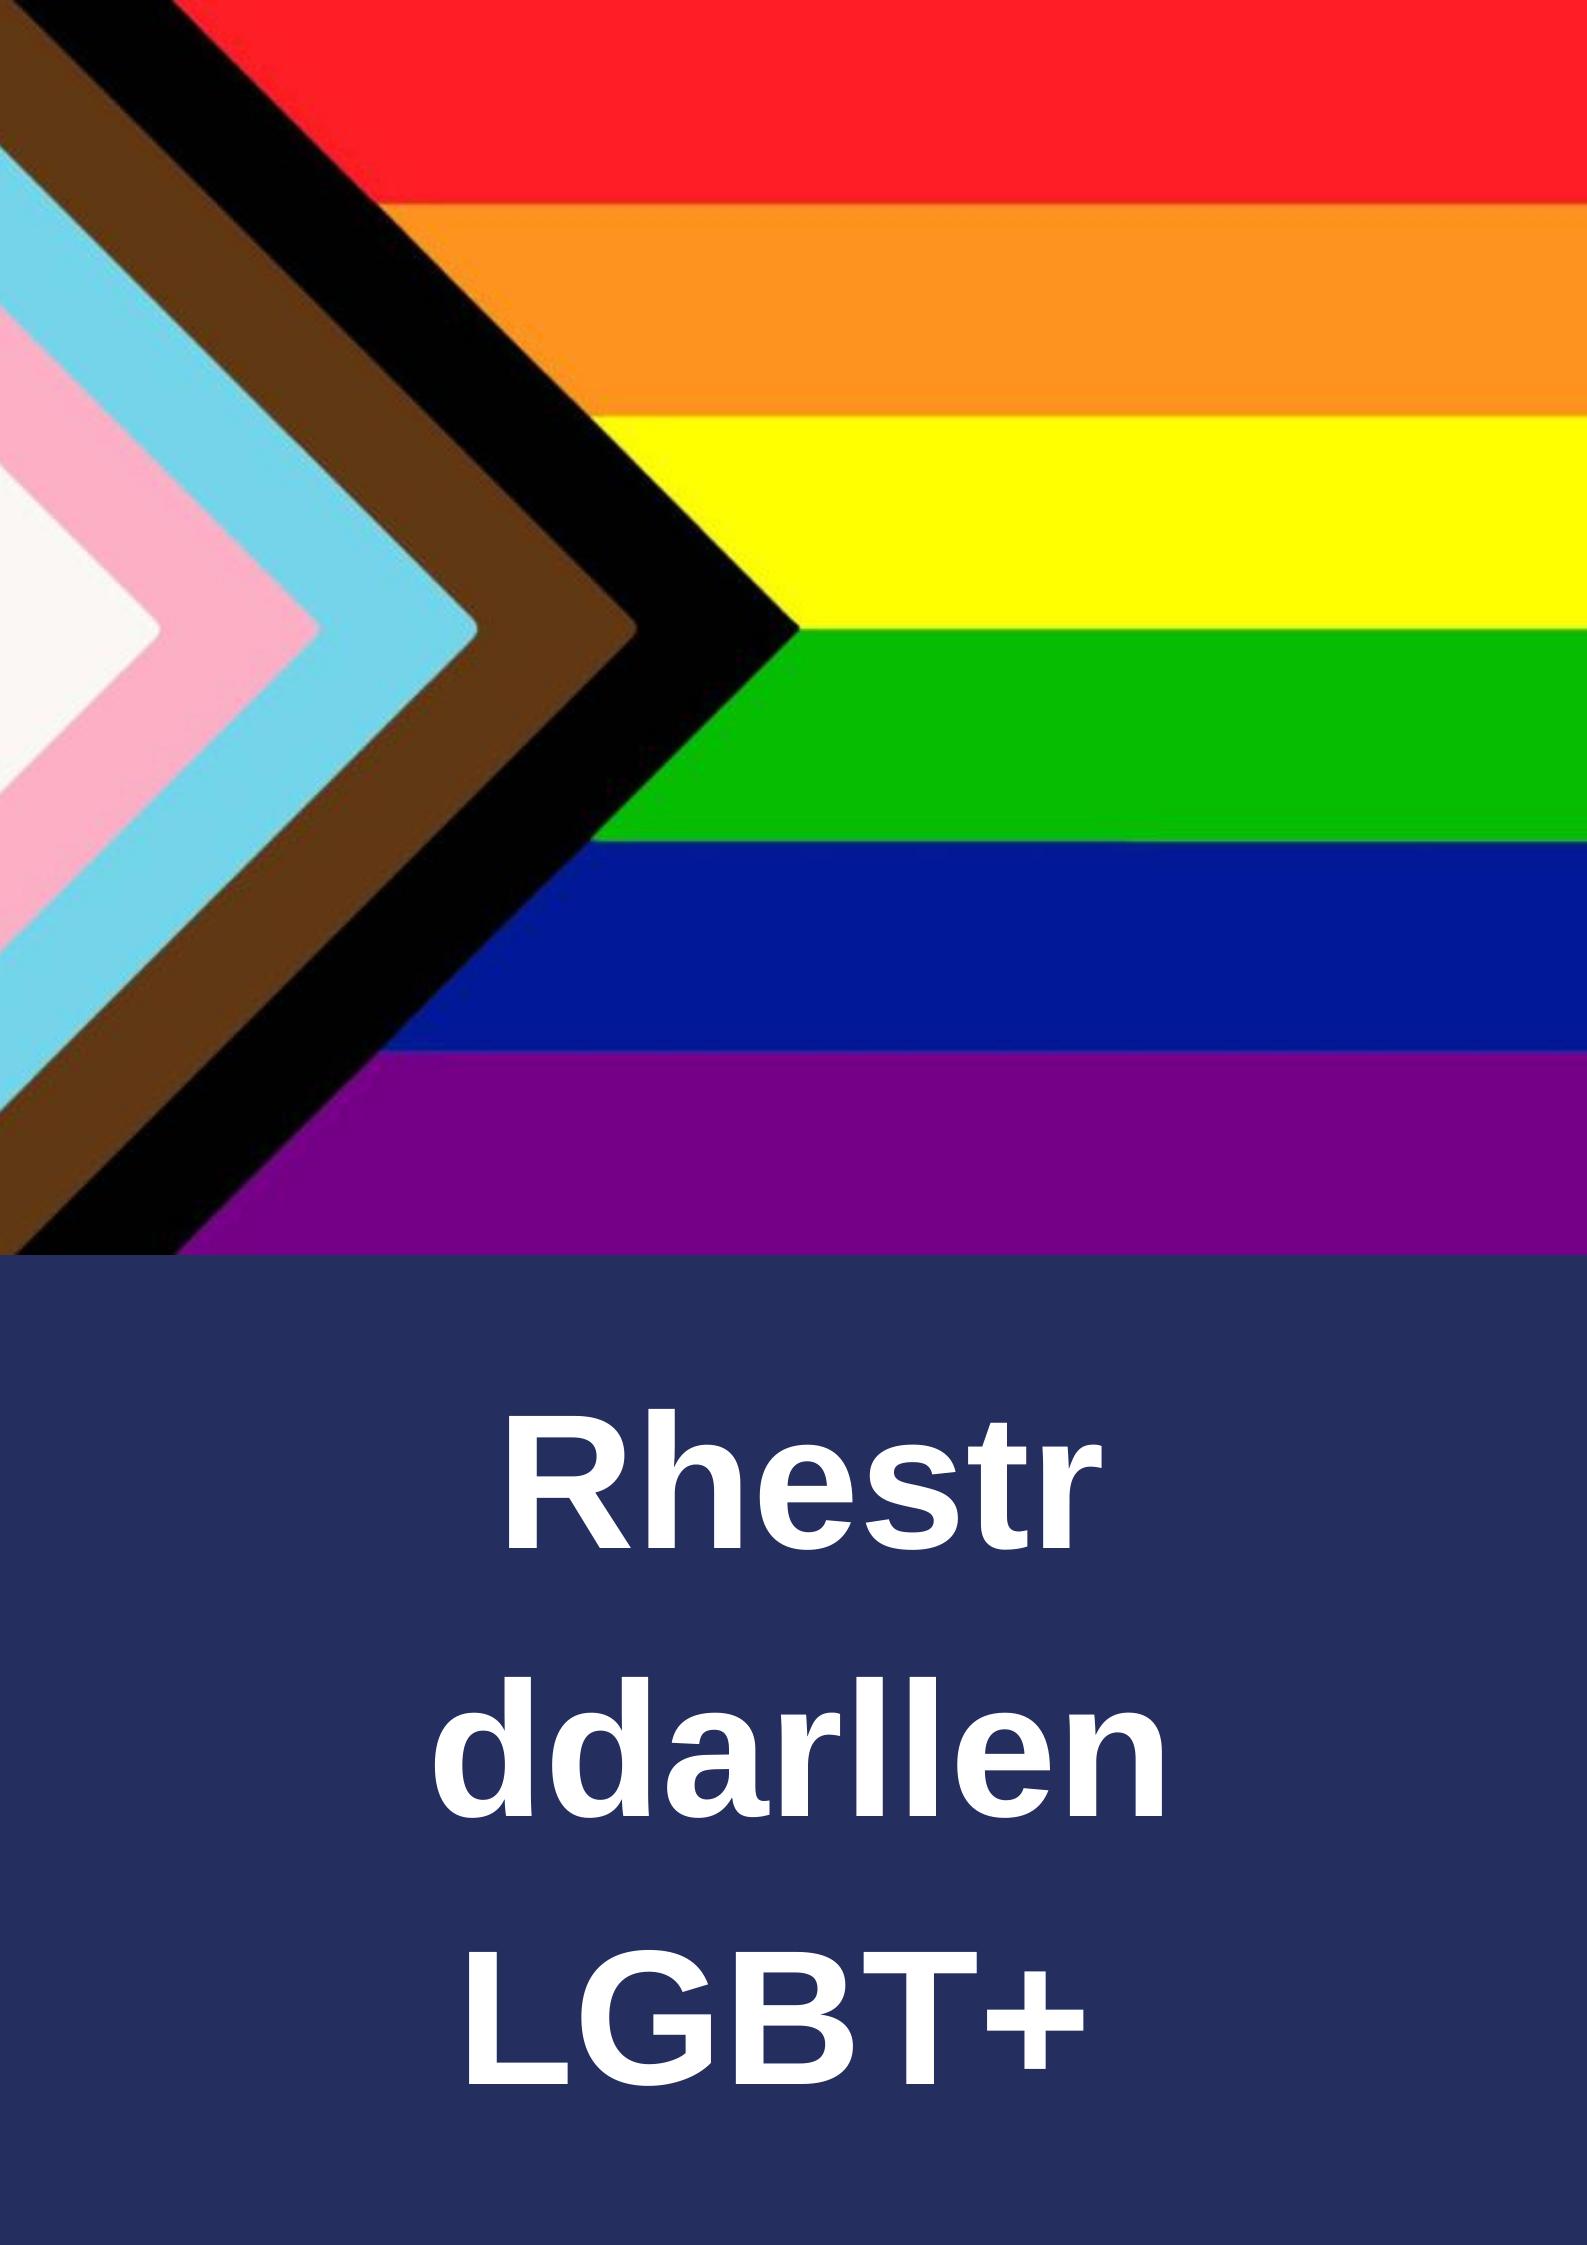 Rhestr ddarllen LGBTQ+